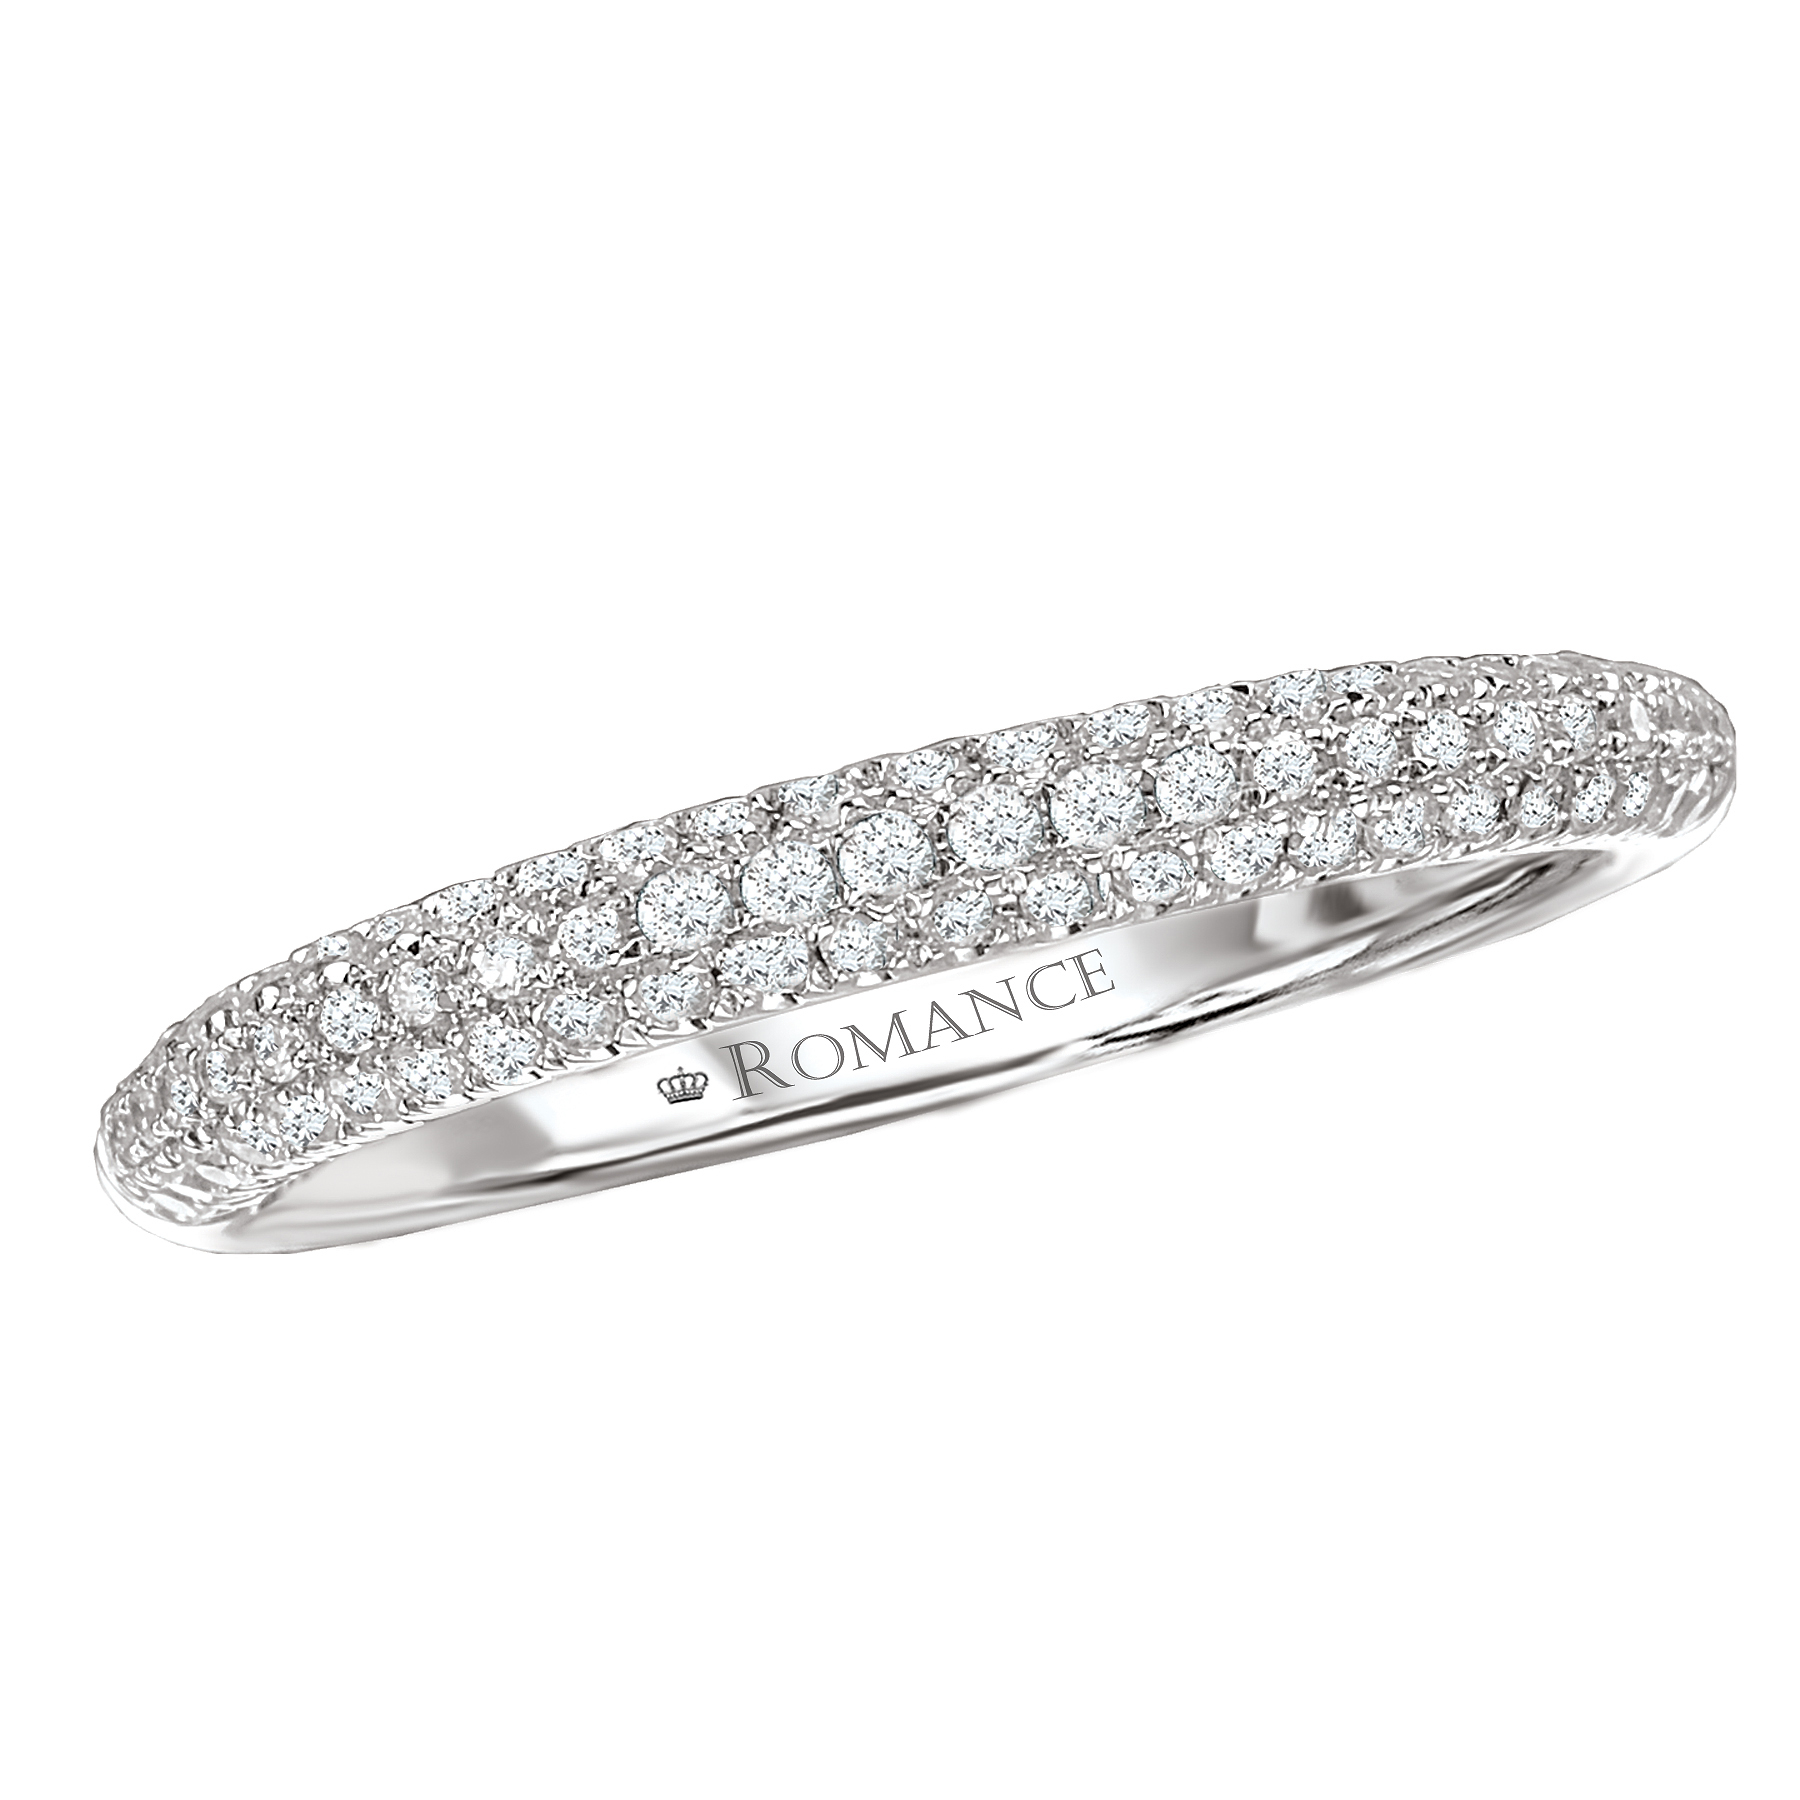 Romance Wedding Bands 118182-W product image